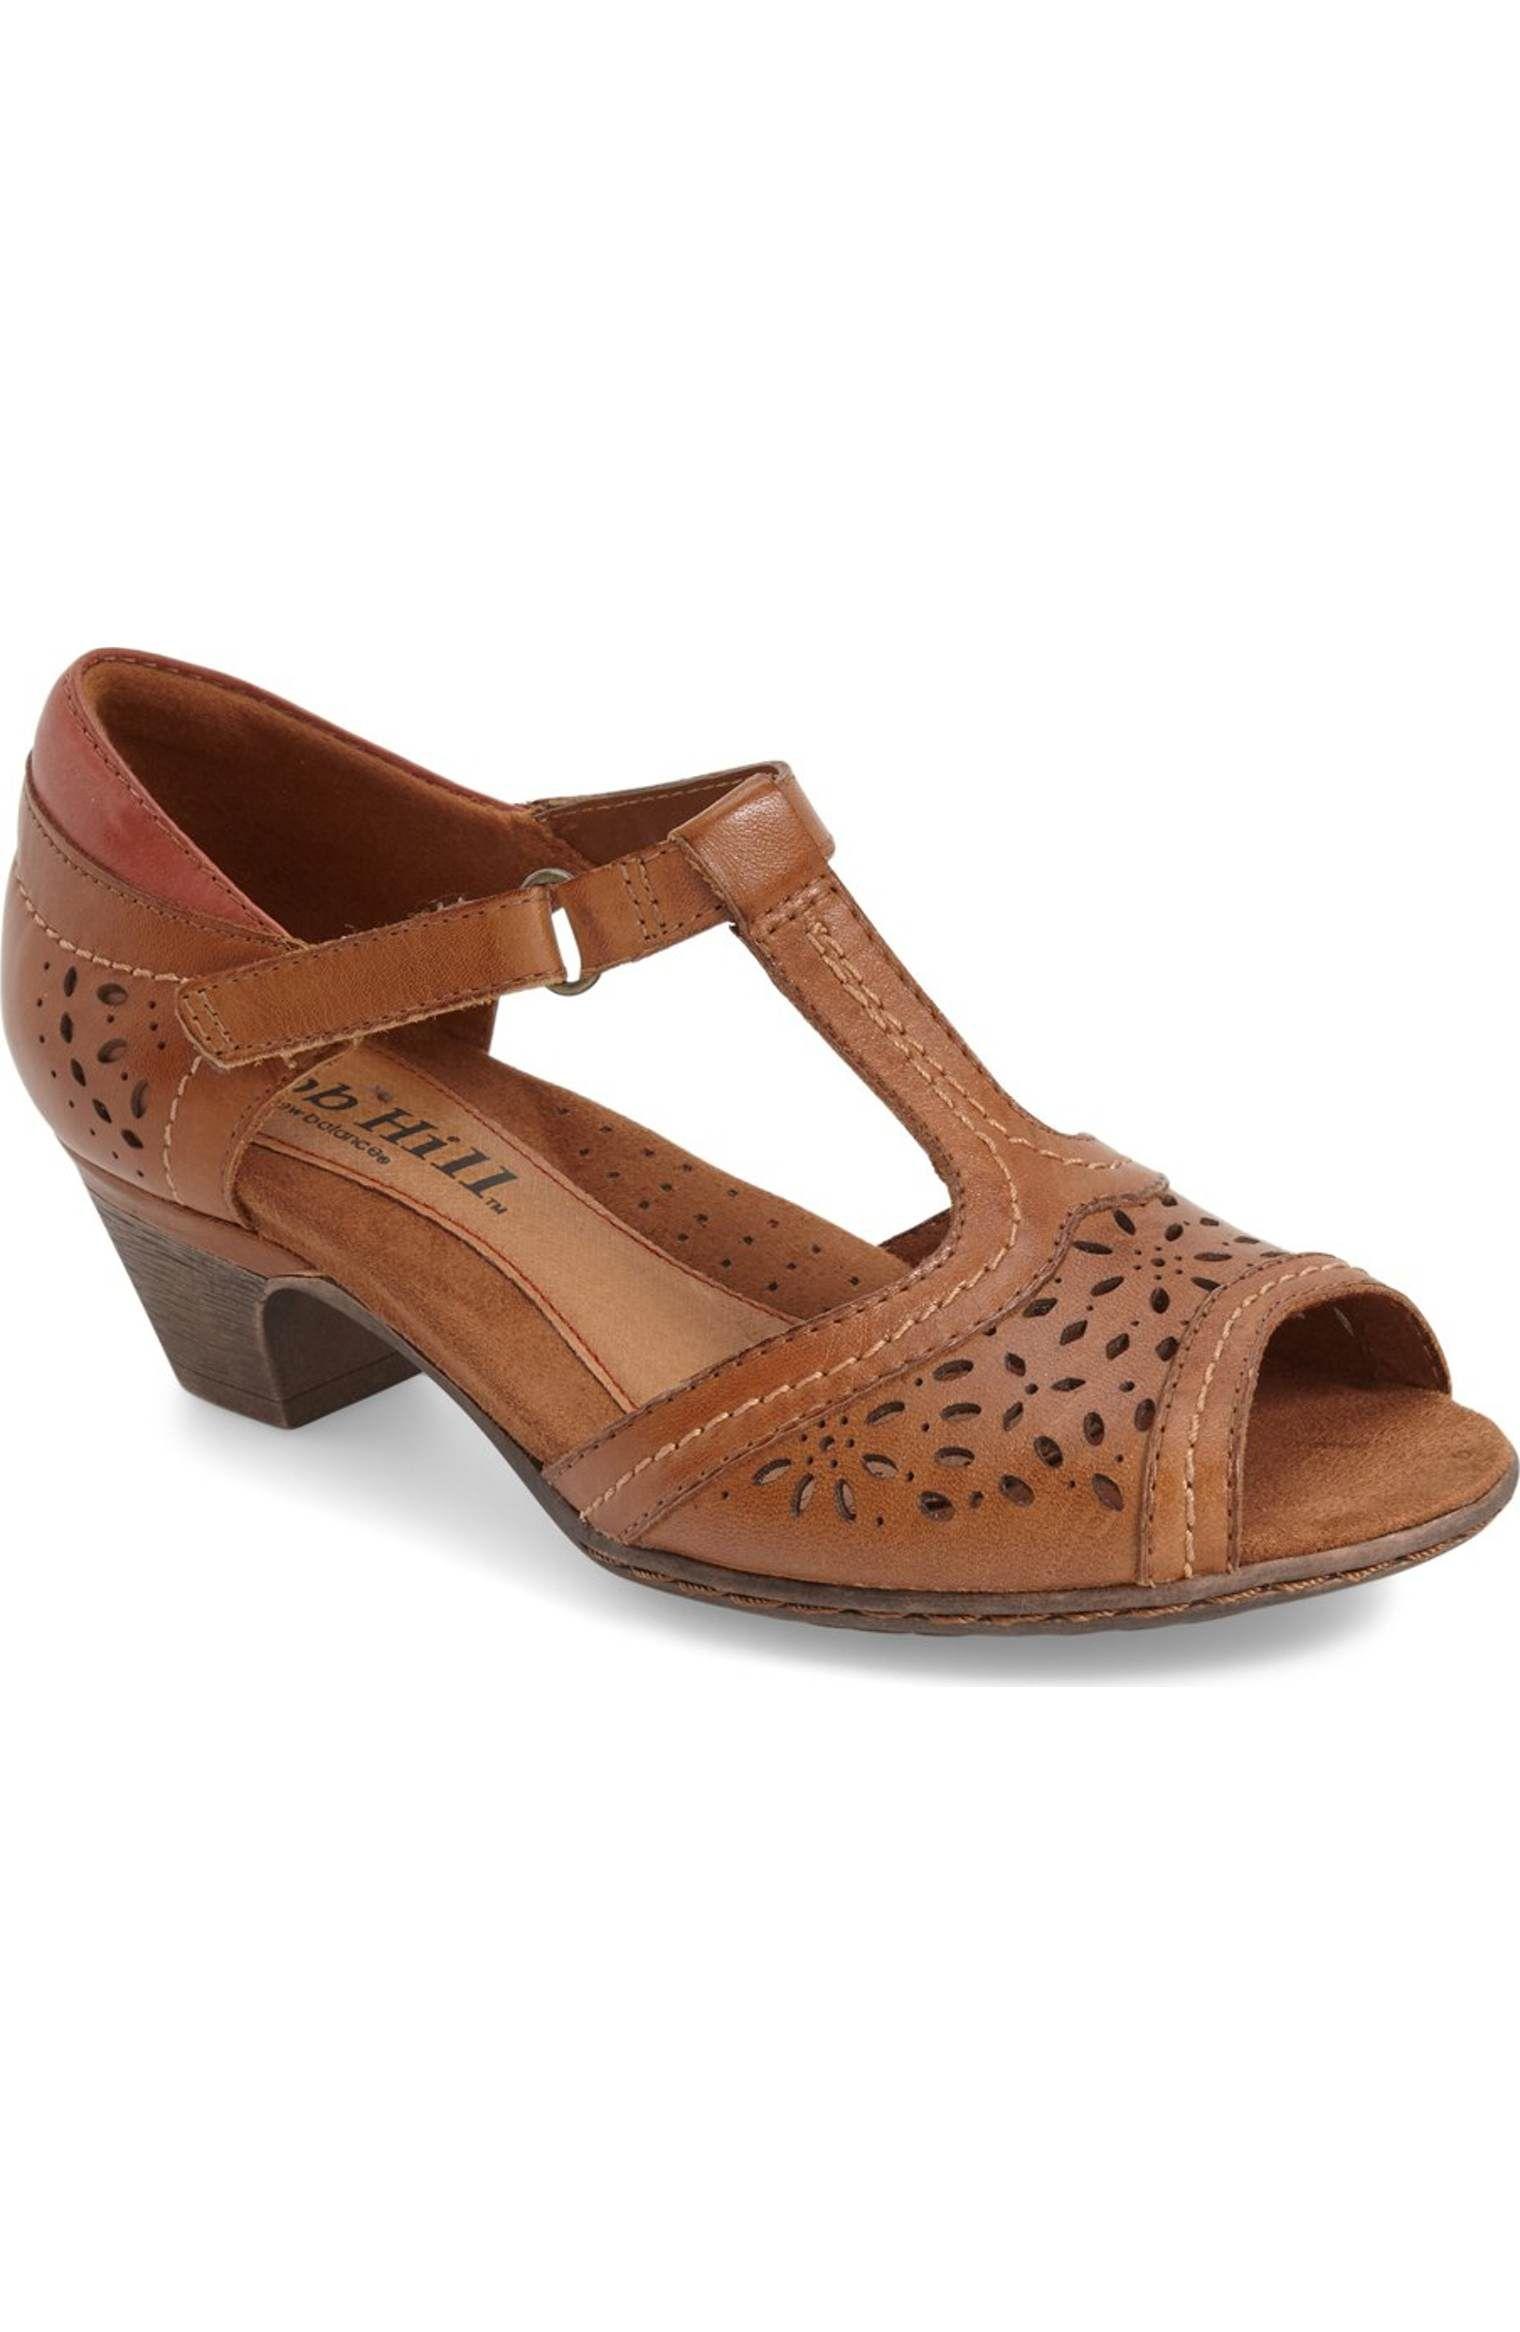 773fc39f150 Main Image - Rockport Cobb Hill  Alyssa  T-Strap Sandal (Women ...